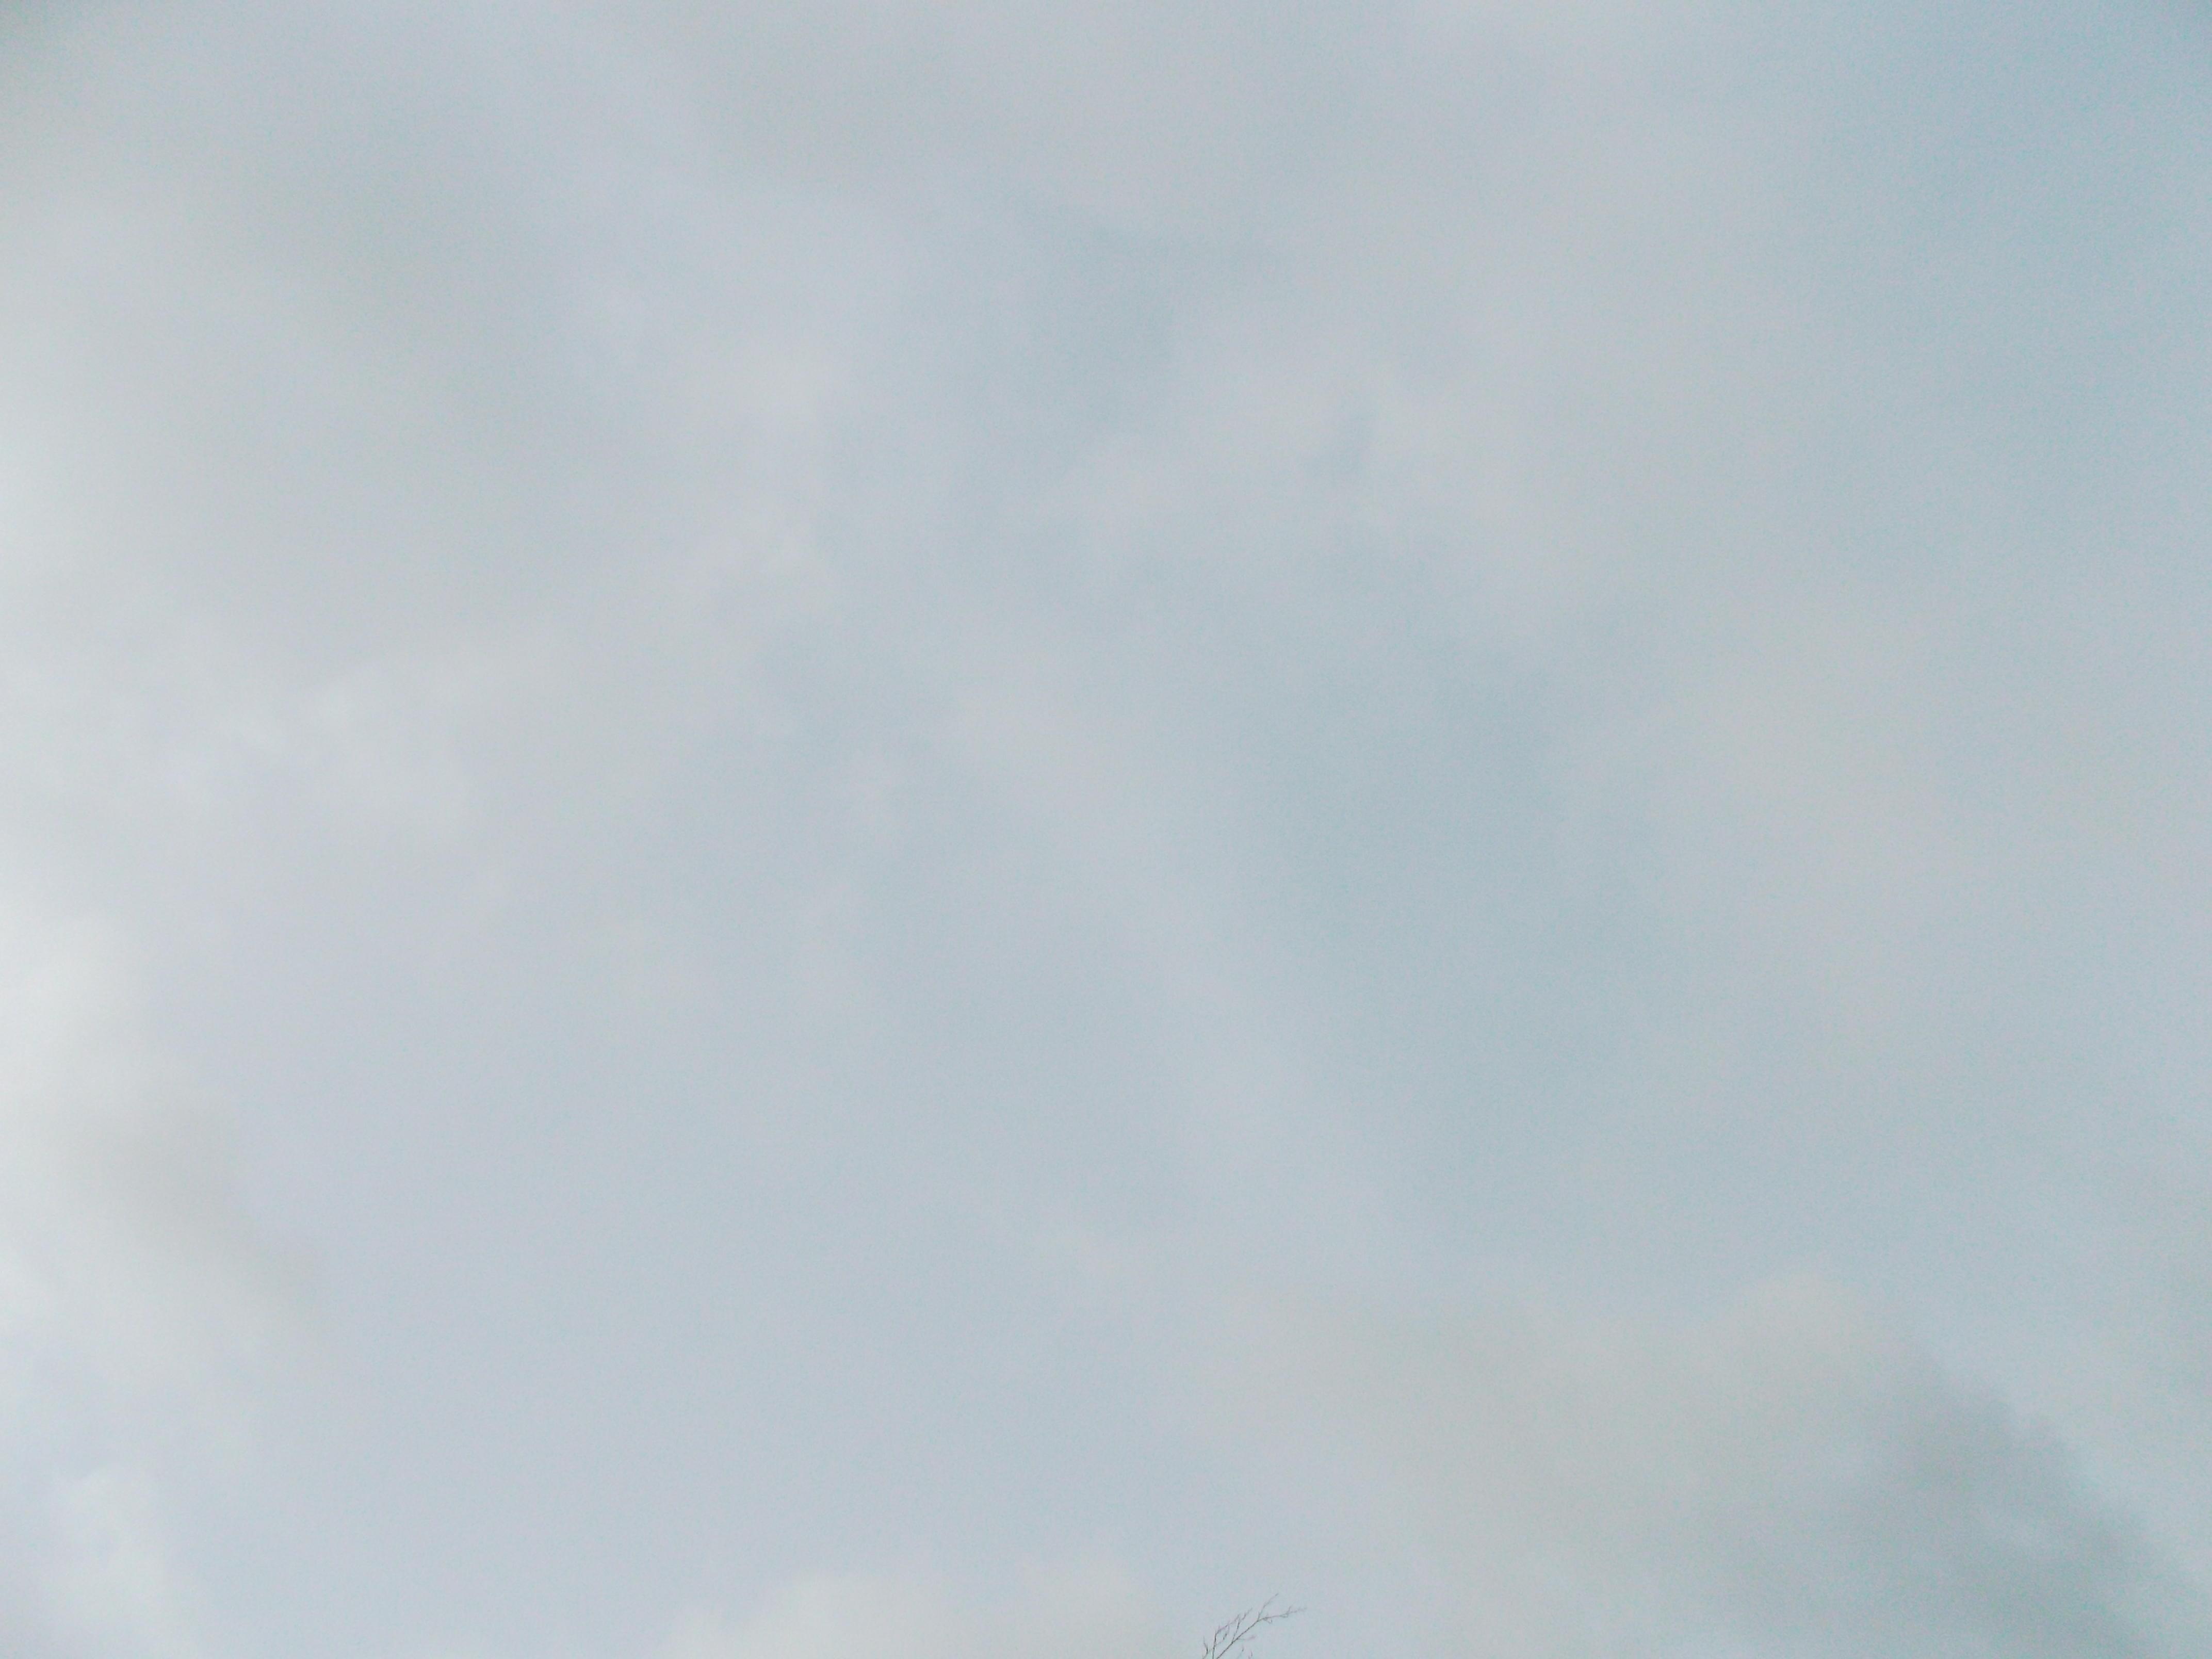 2013-01-31 Longitude -0.371 Latitude 49.182 Altitude 13 Heure 13h39